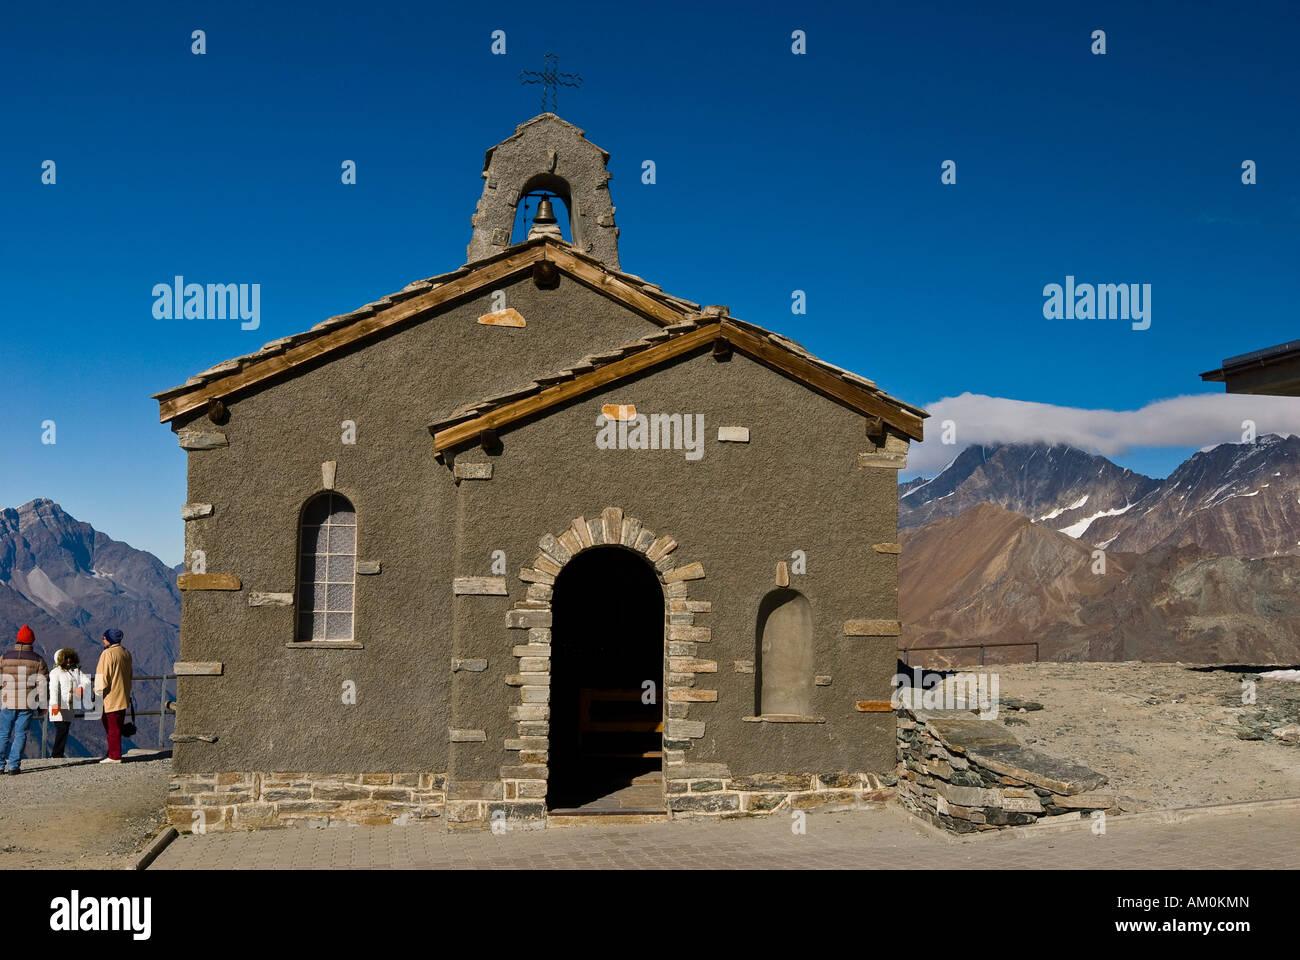 Chapell on Gornergrat, Zermatt, Switzerland - Stock Image